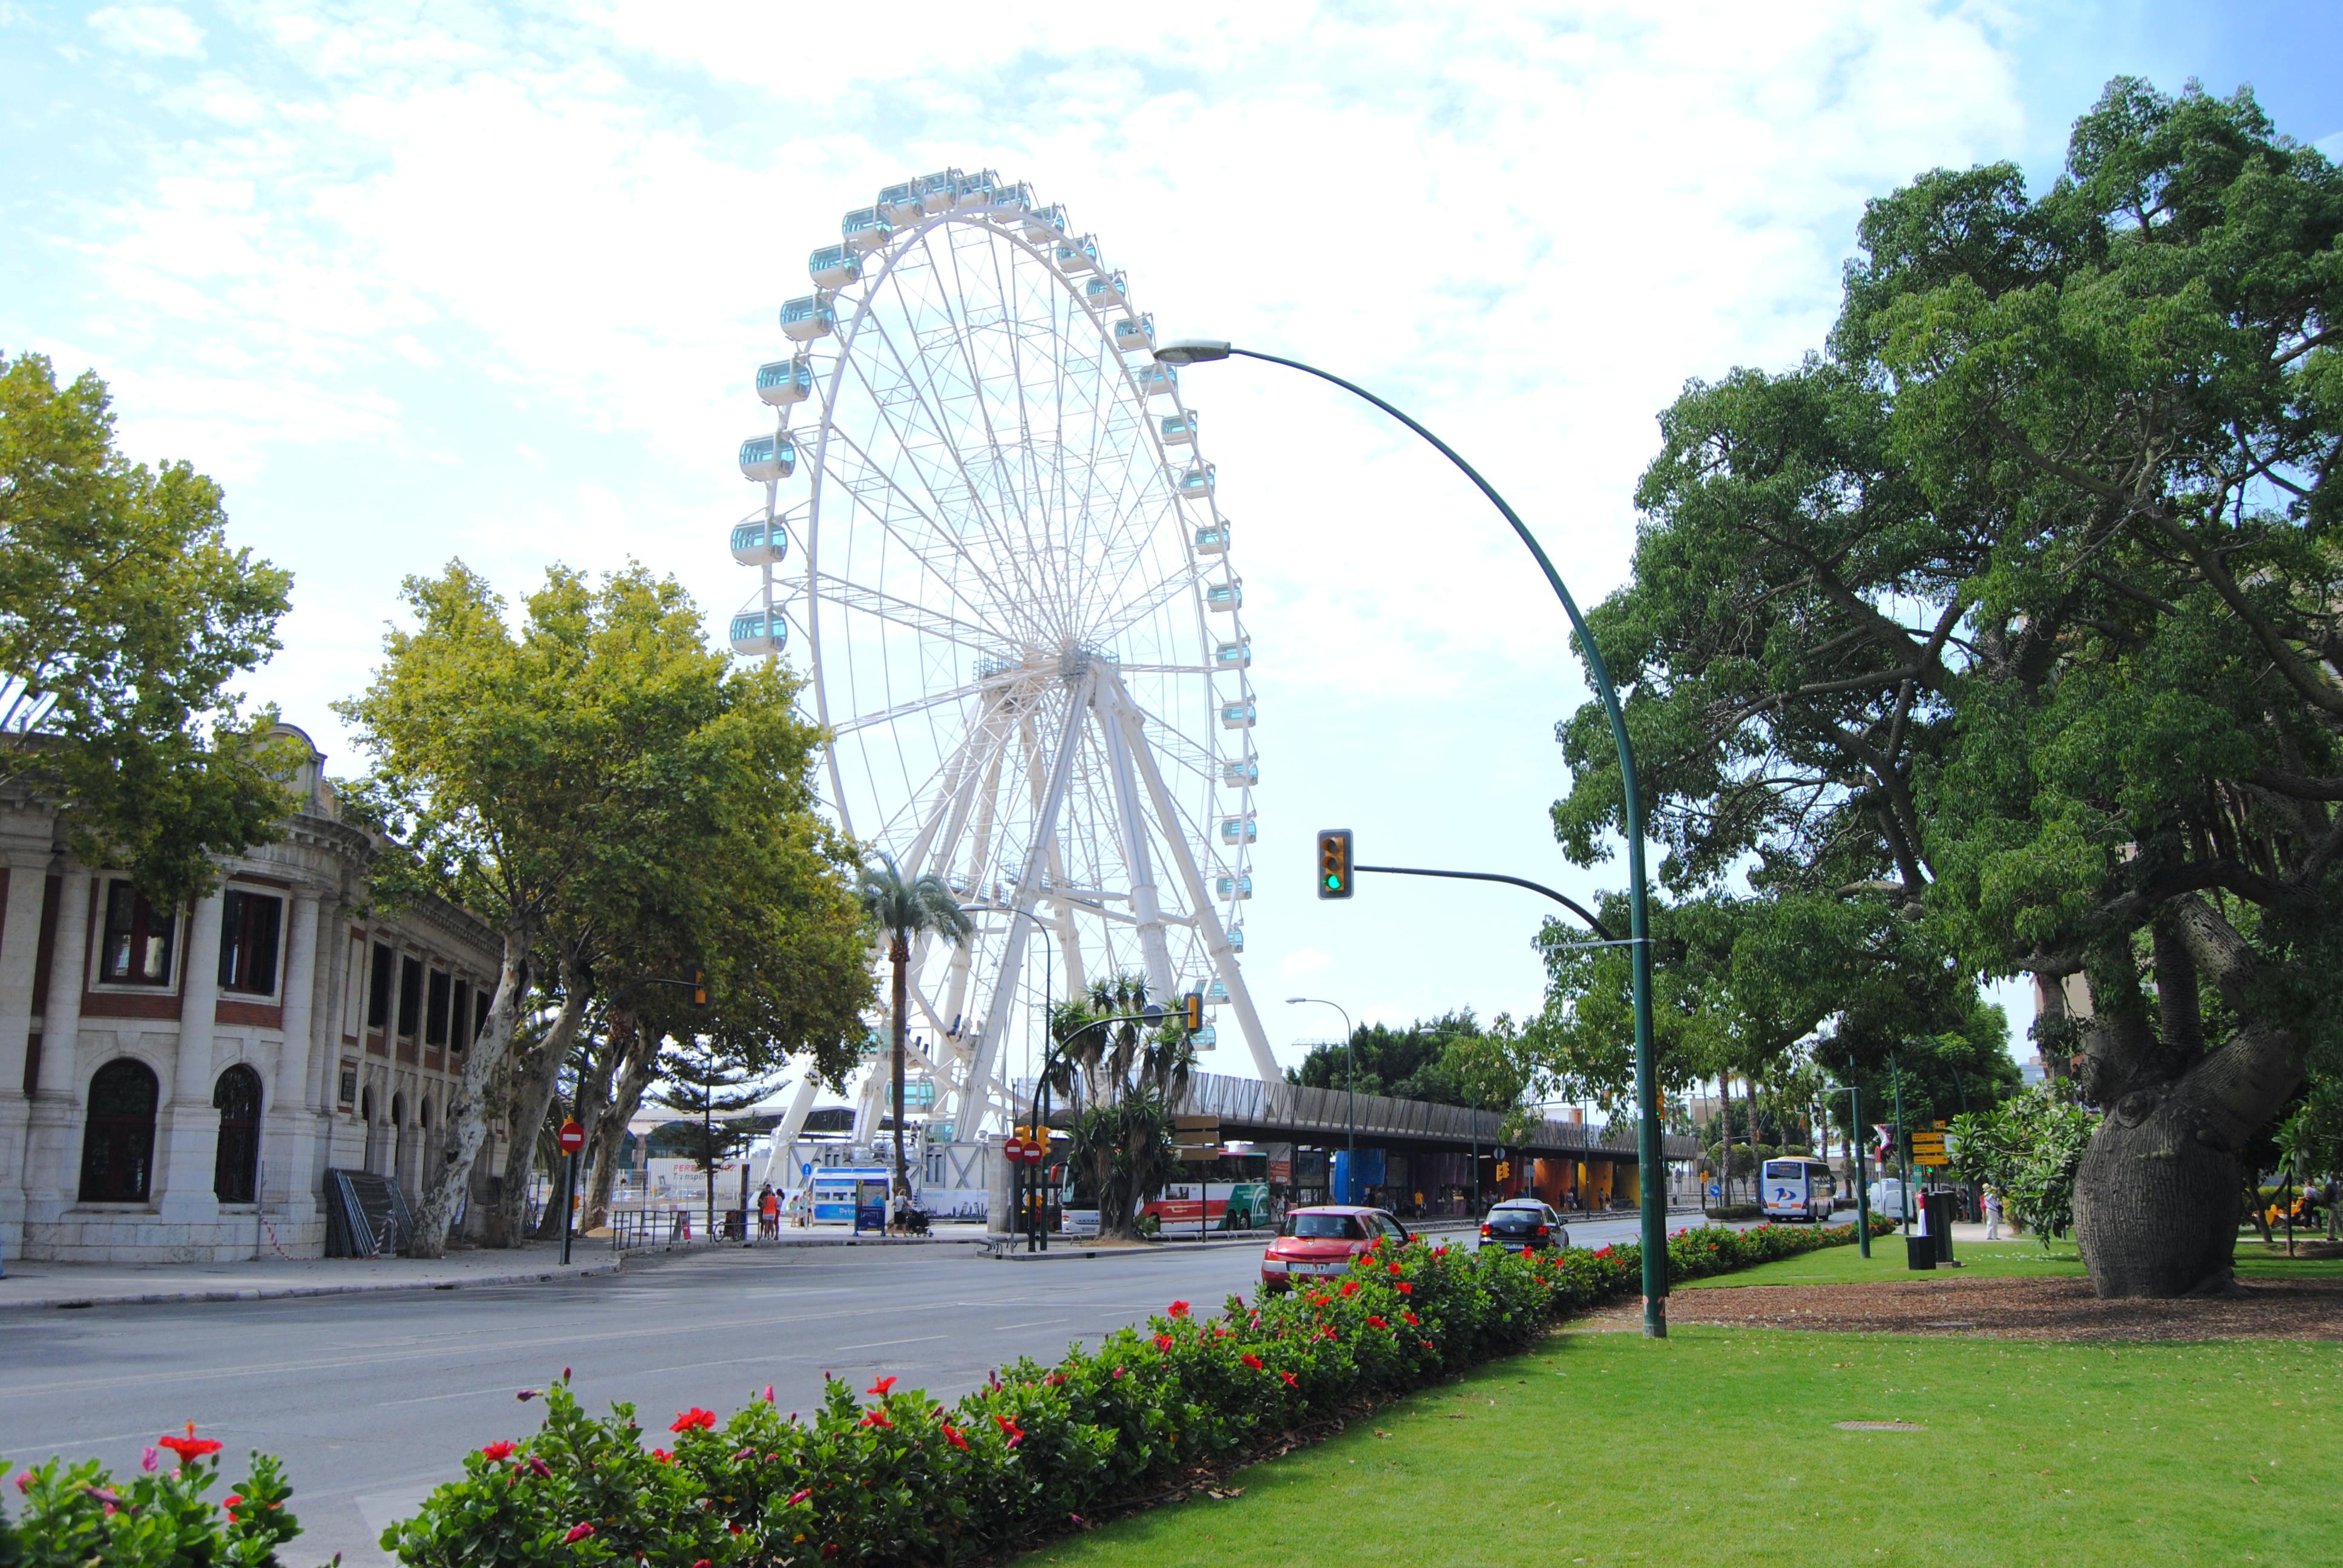 malaga ferris wheel view